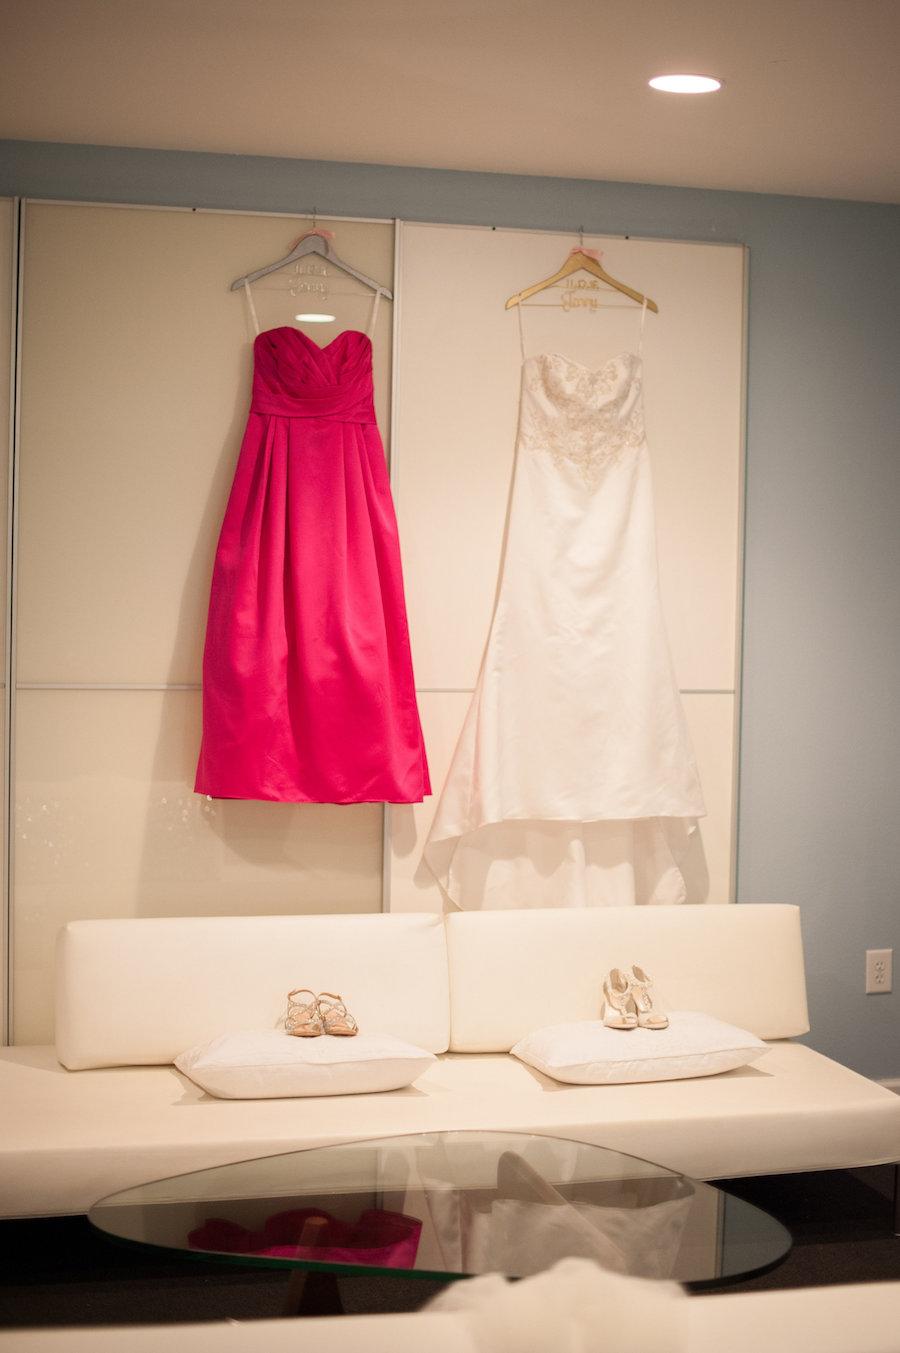 Strapless, Ivory Beaded Wedding Dress and Hot Pink Bridesmaids Dress